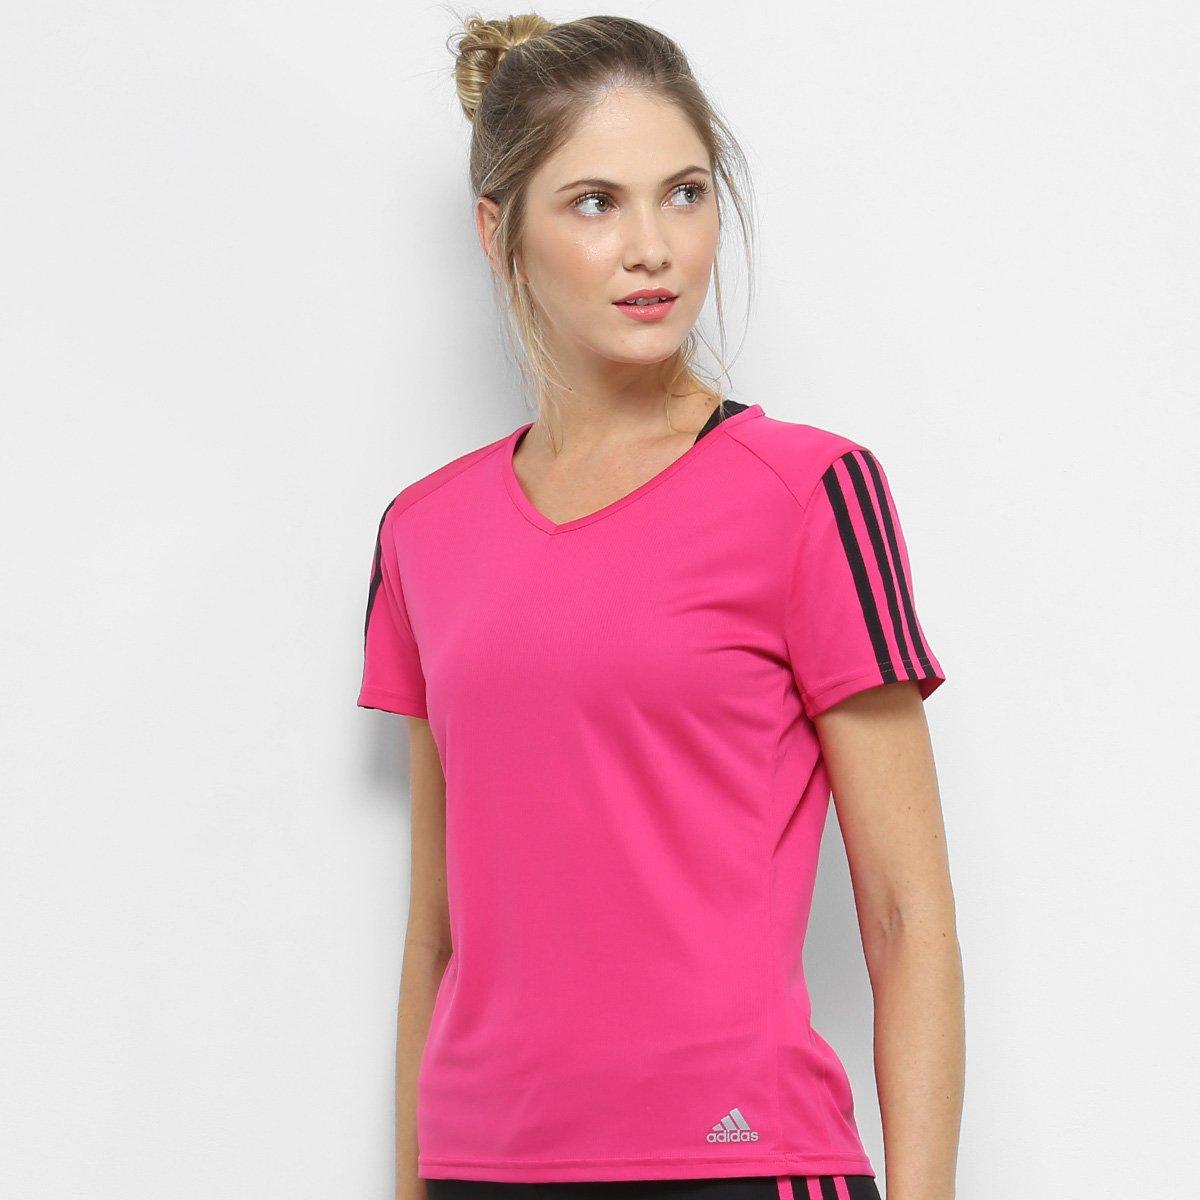 Camiseta Adidas Run 3S Feminina - Rosa e Preto - Compre Agora  225caf6a963a3